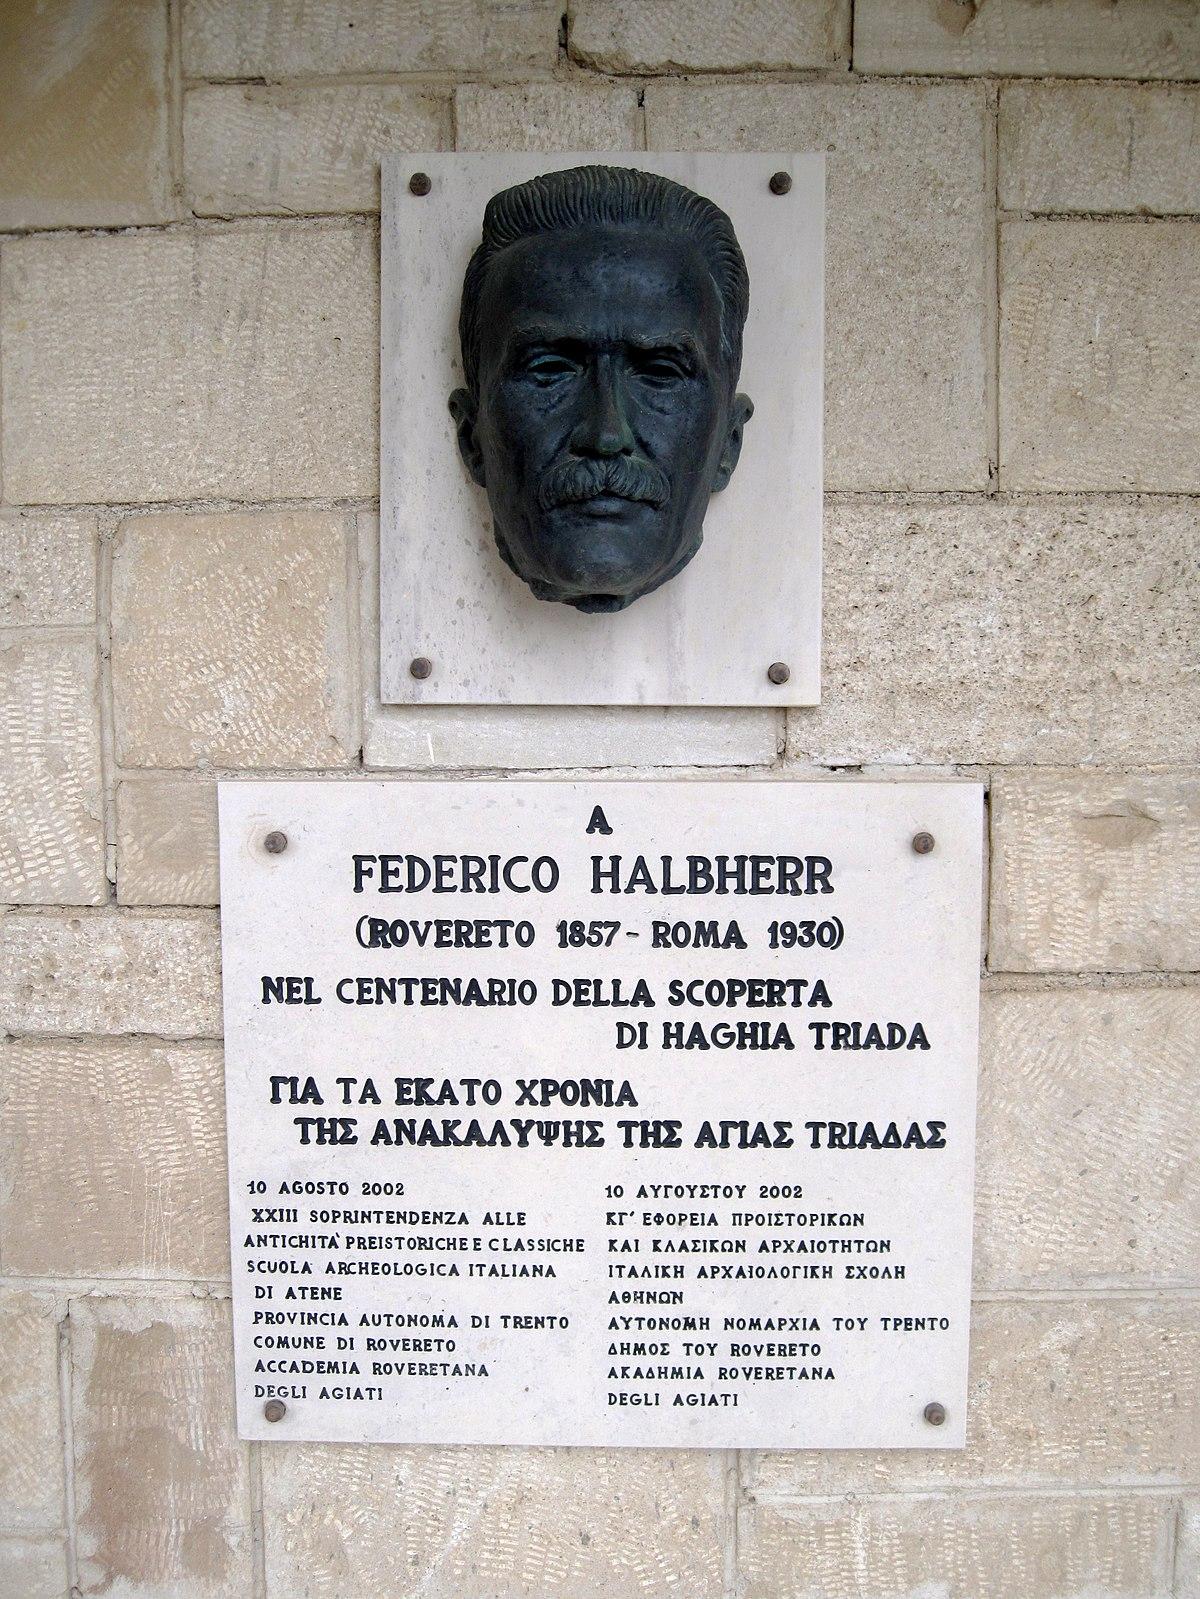 Federico Halbherr - Wikipedia